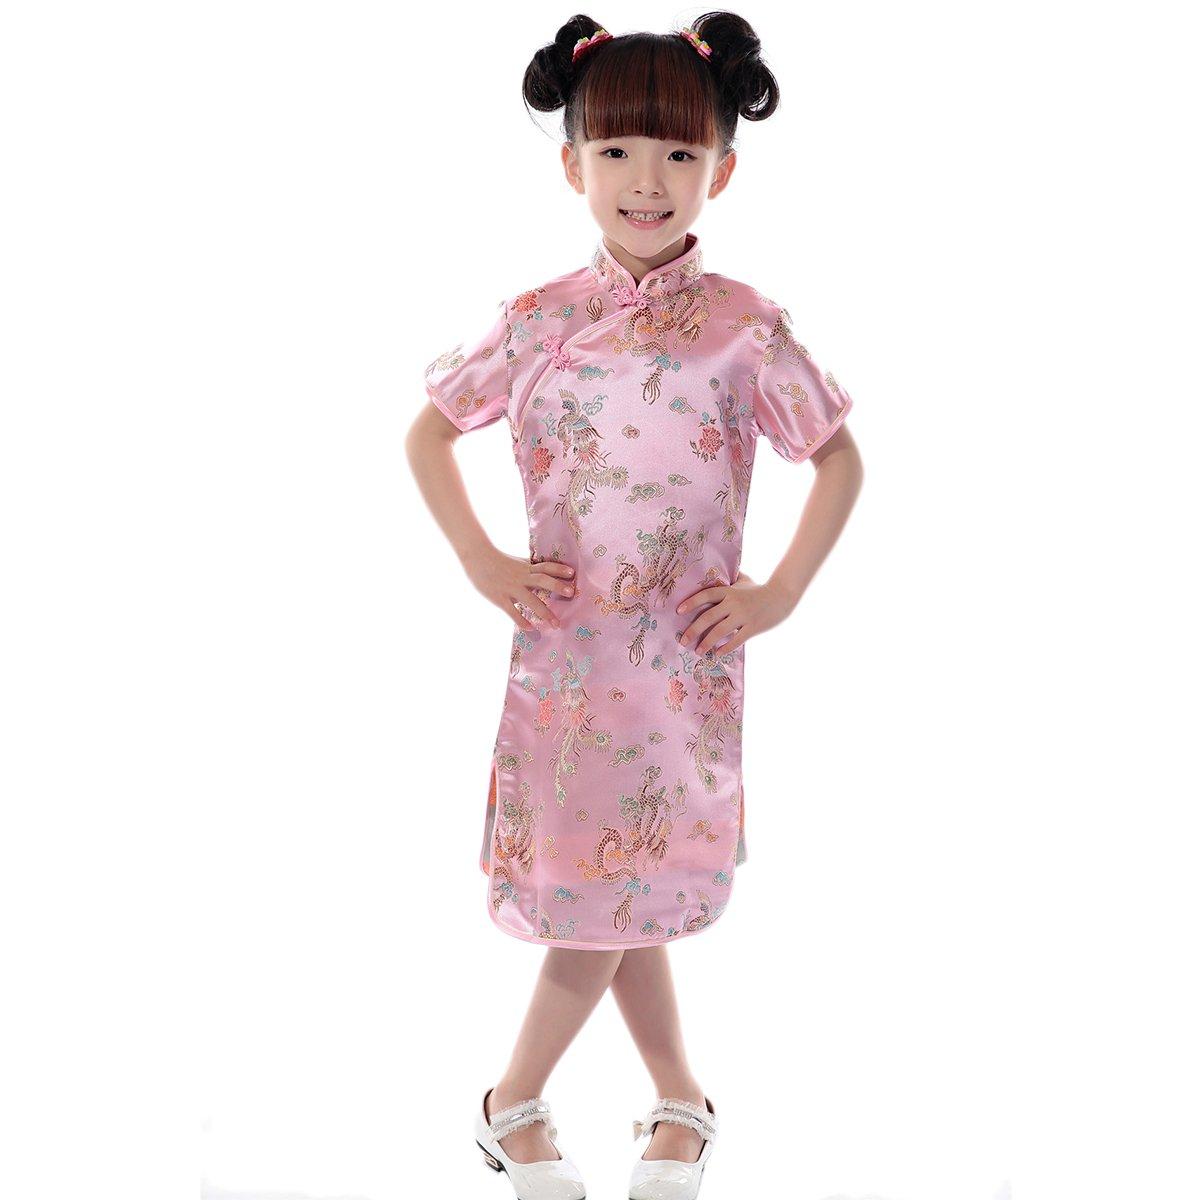 df396bfdb Amazon.com: Little Big Girl Chinese Dragon Phoenix Qipao Cheongsam Dress  for Kids Floral Summer Mini Traditional Costume Dance Gown: Clothing